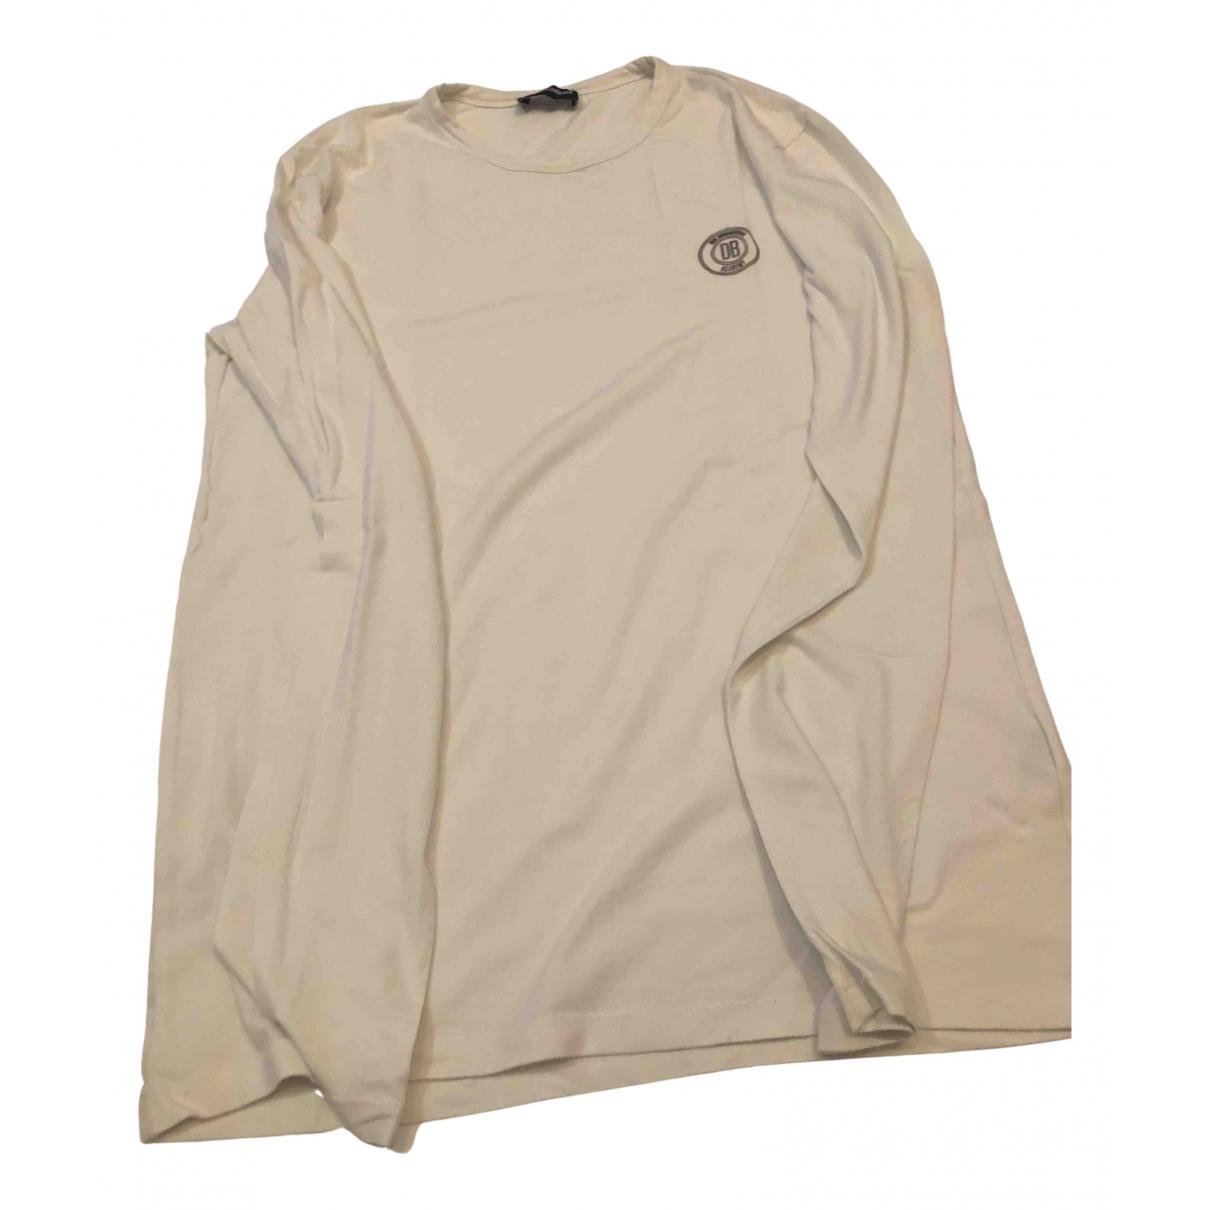 Dirk Bikkembergs - Tee shirts   pour homme en coton - blanc